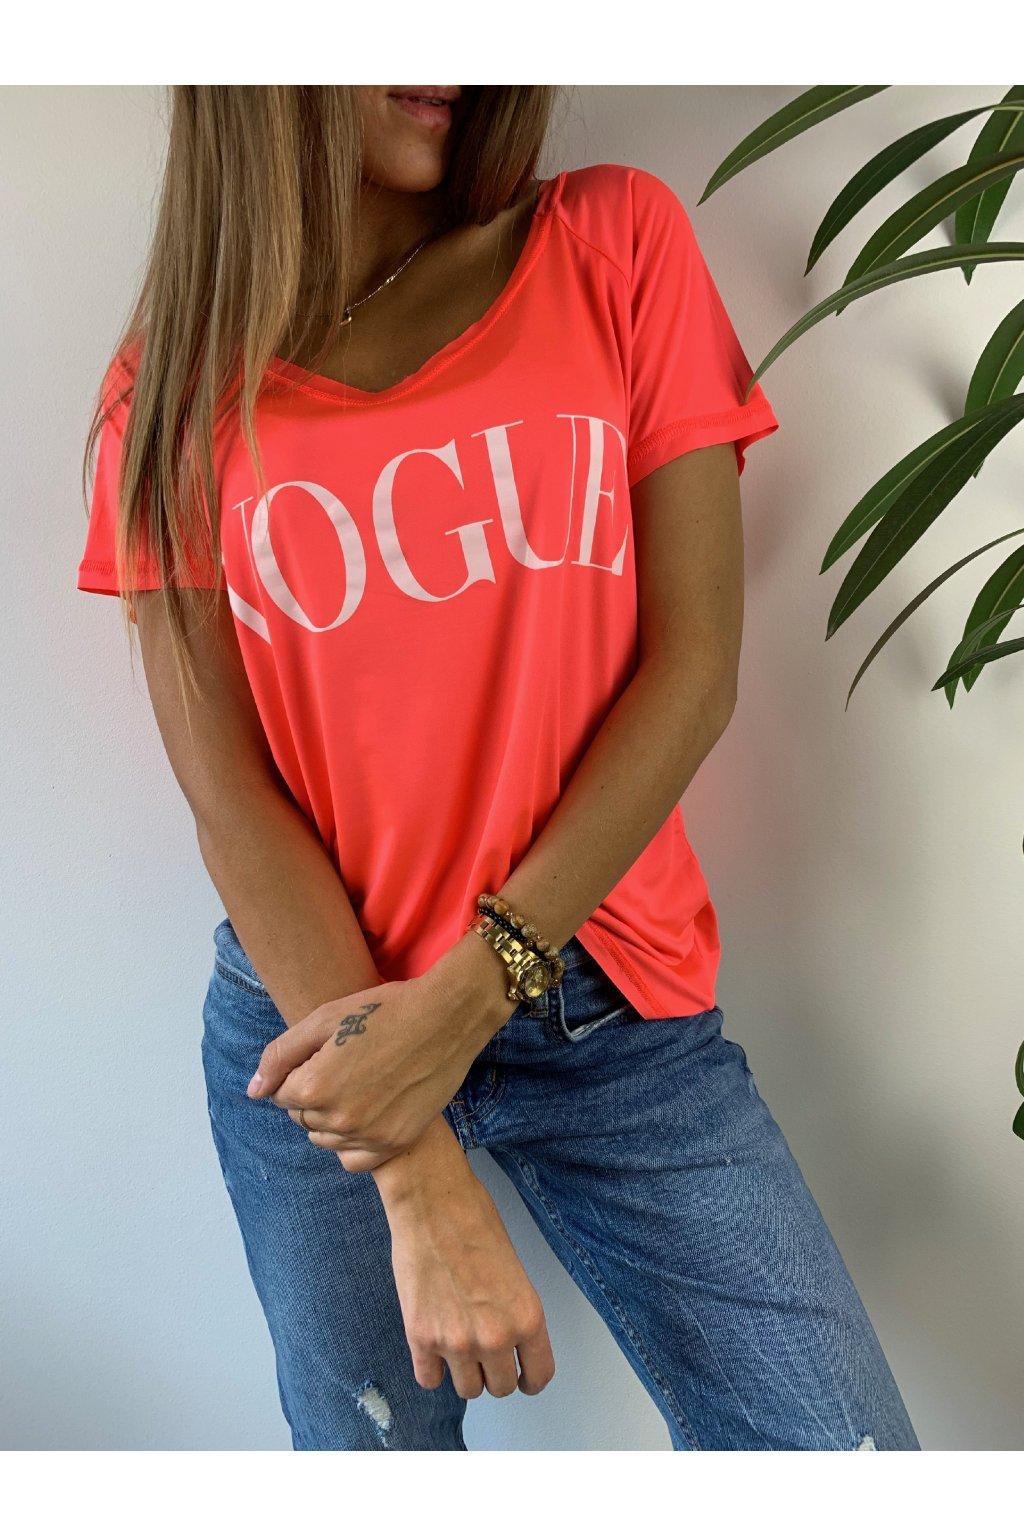 52c52f1ddbda Eshopat Dámské tričko Vogue Neon Orange